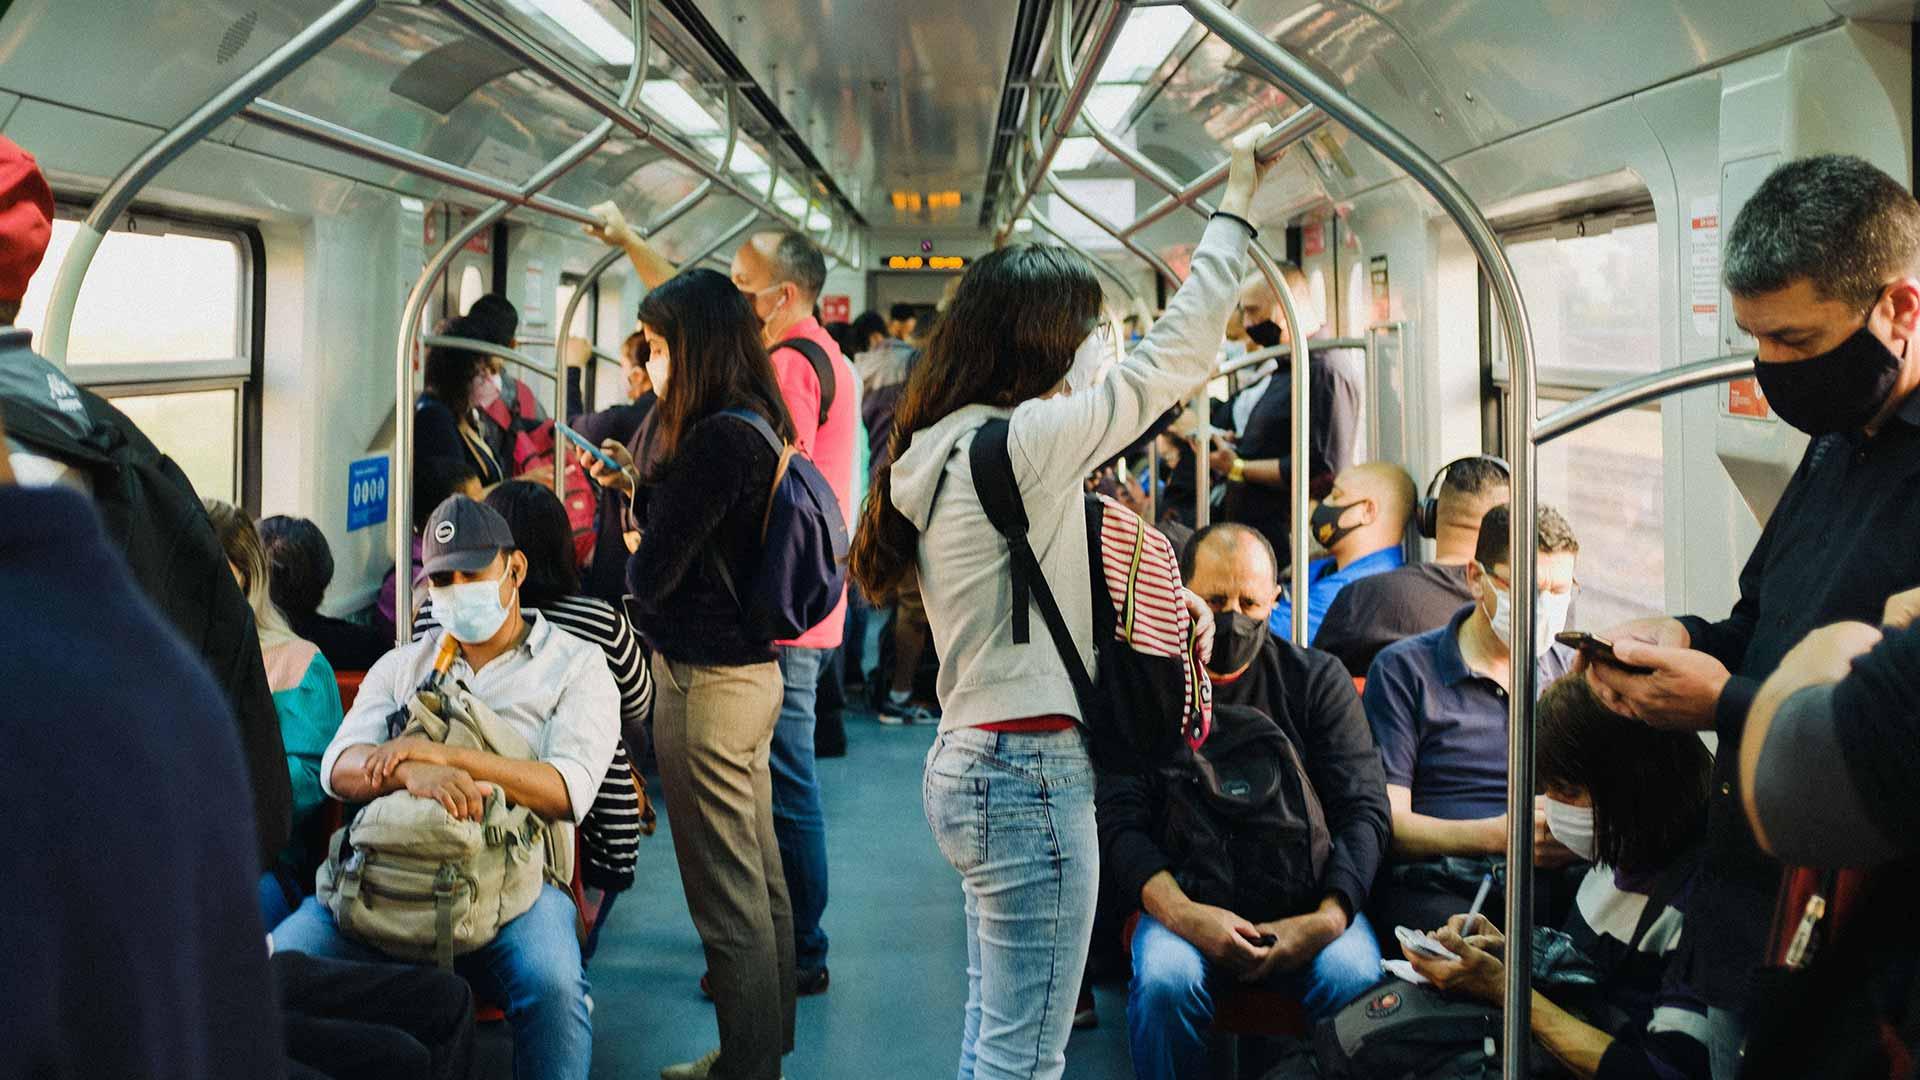 A dozen passengers aboard a train in a city.